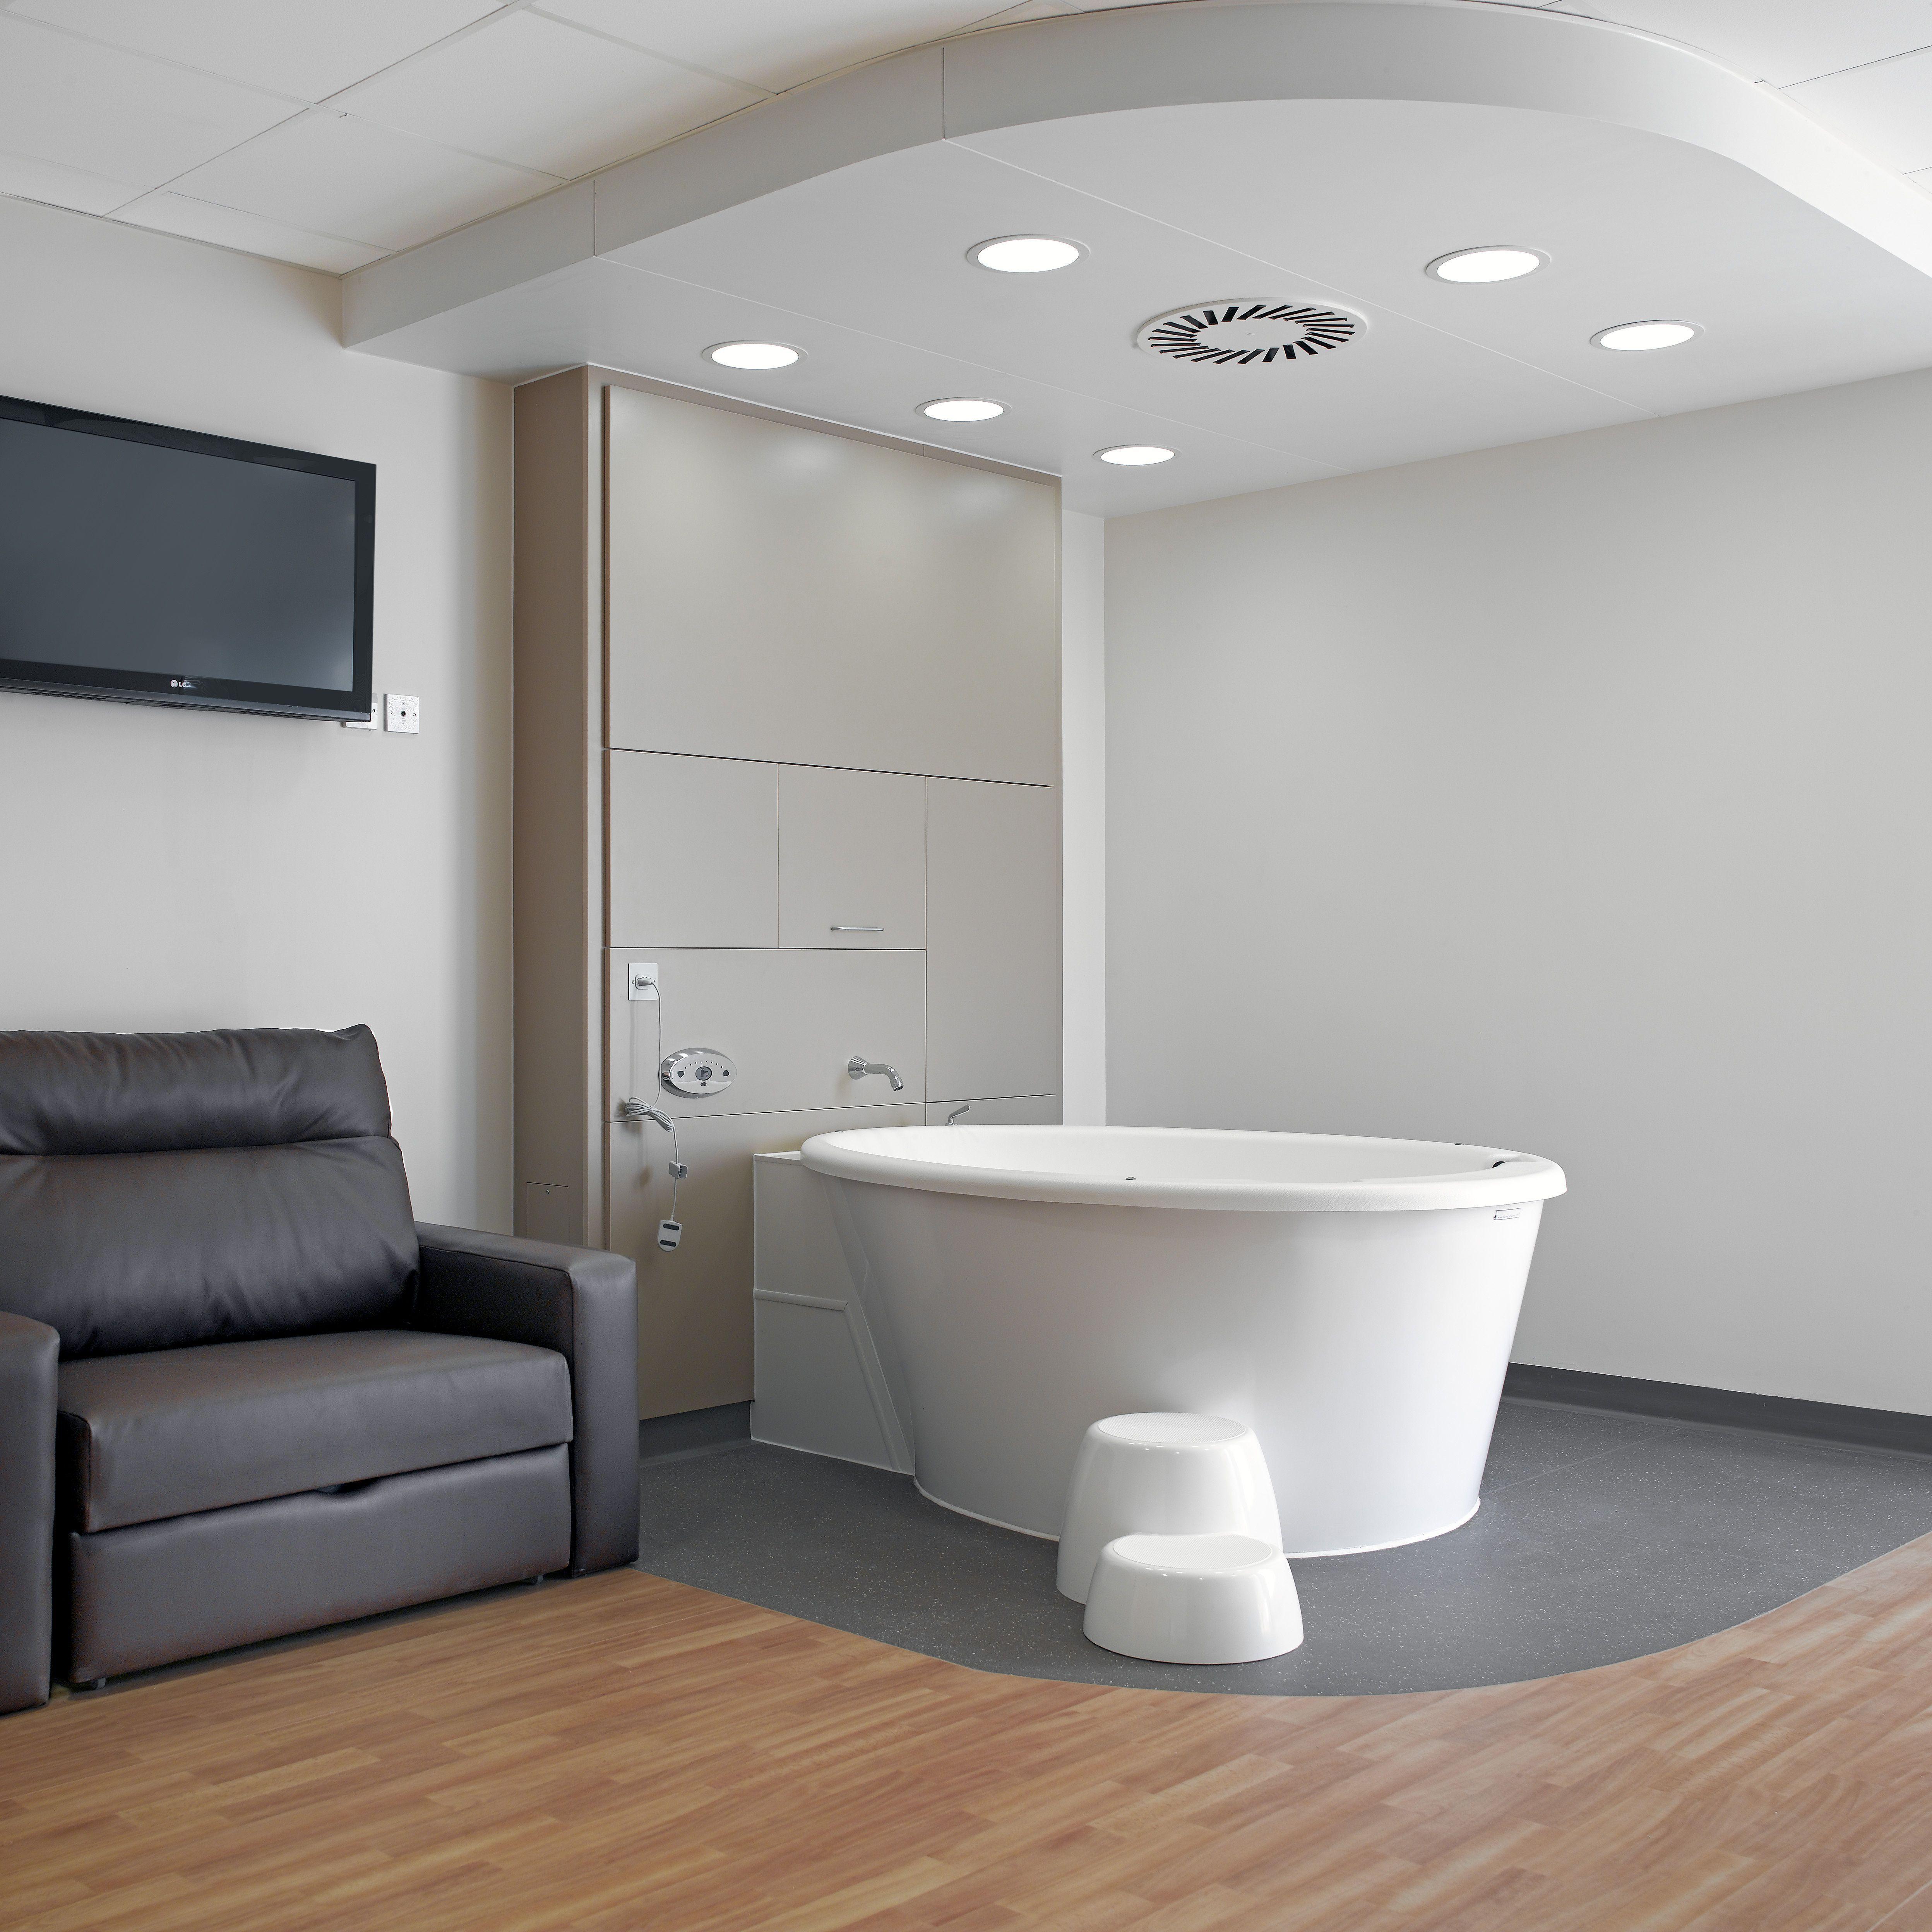 Edinburgh birth centre Birthing suite, Room, Clinic design